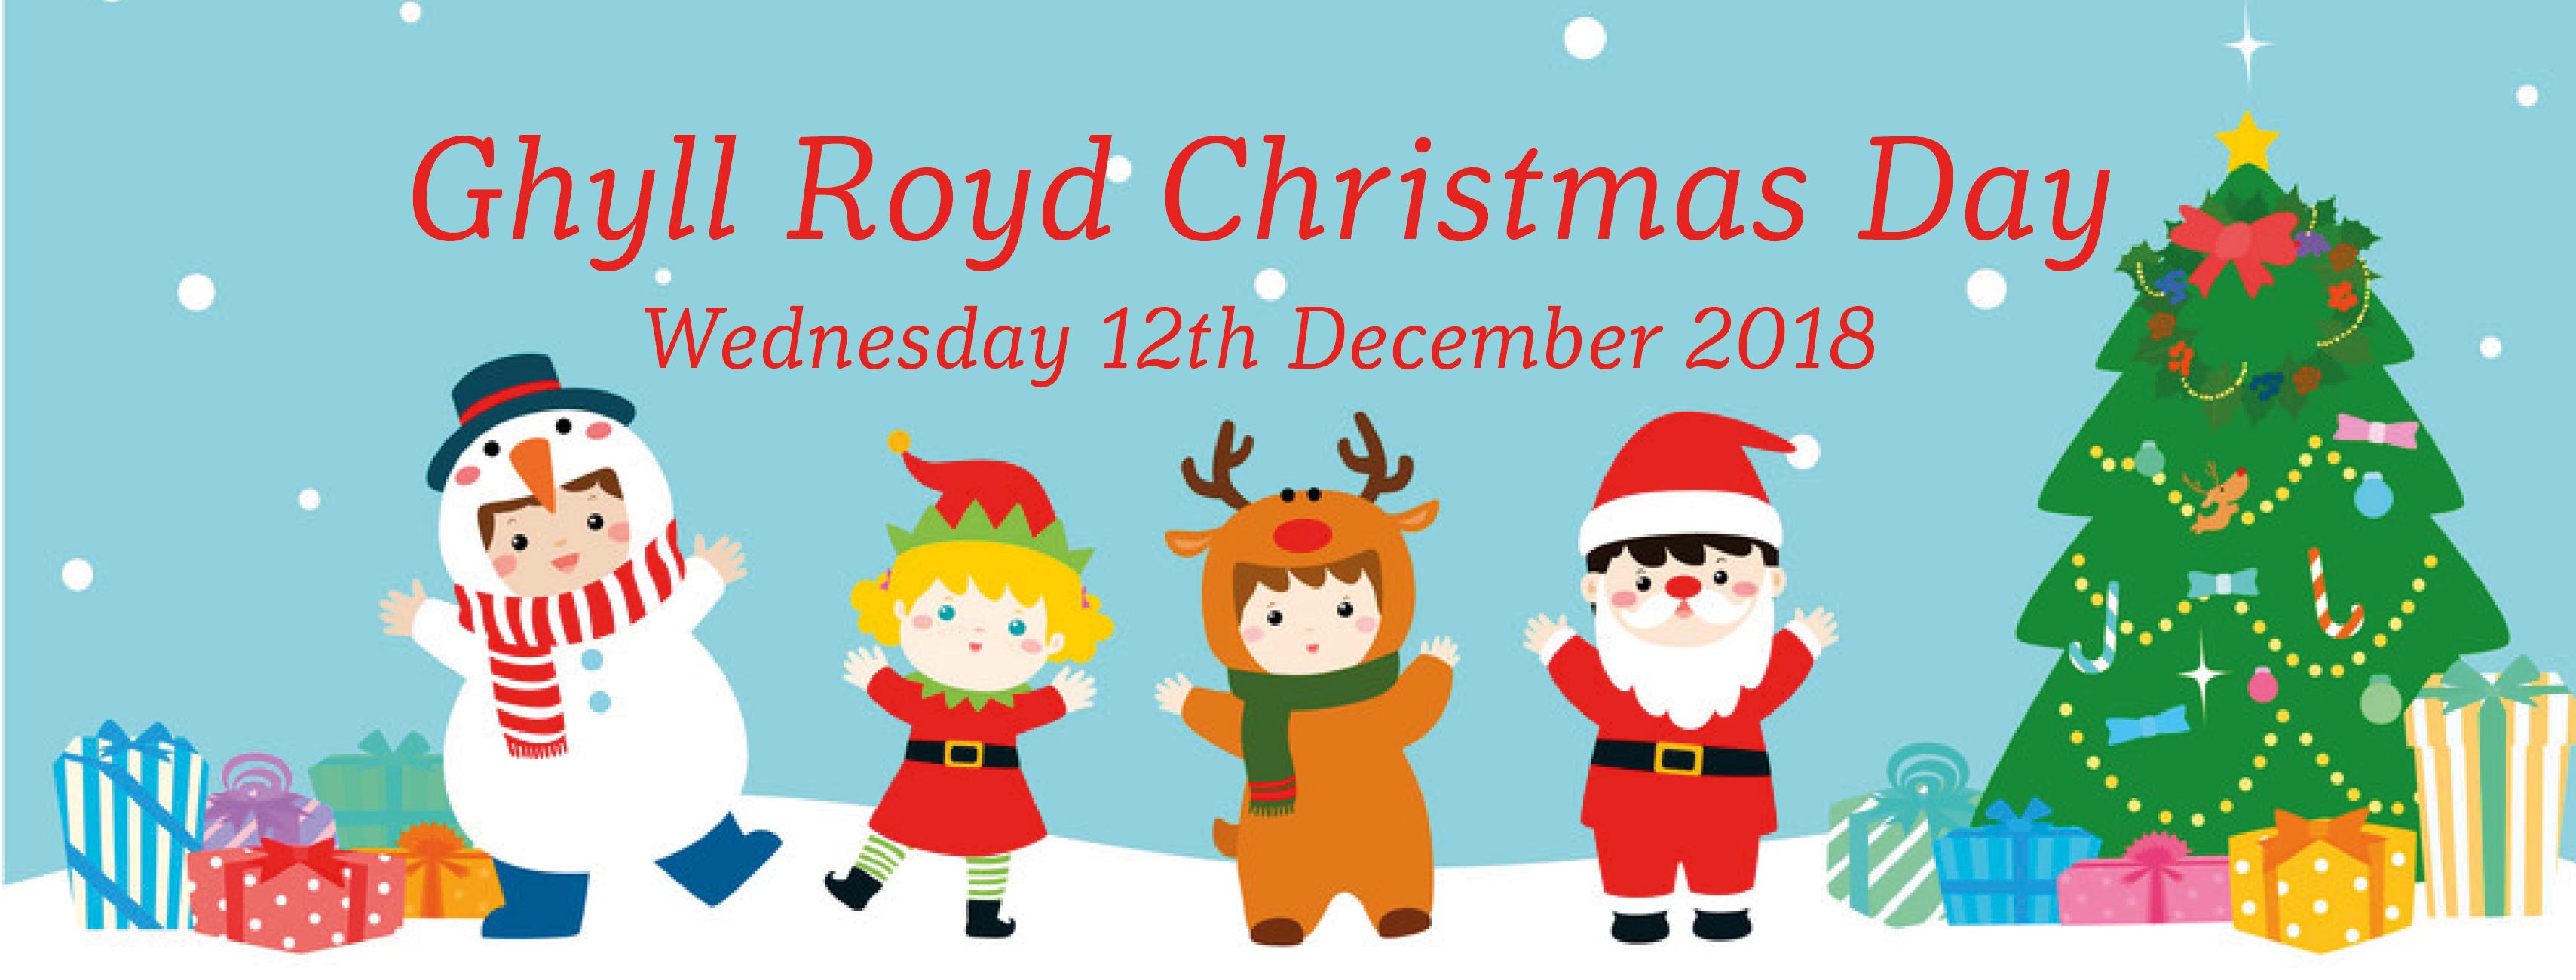 Christmas Day at Ghyll Royd School